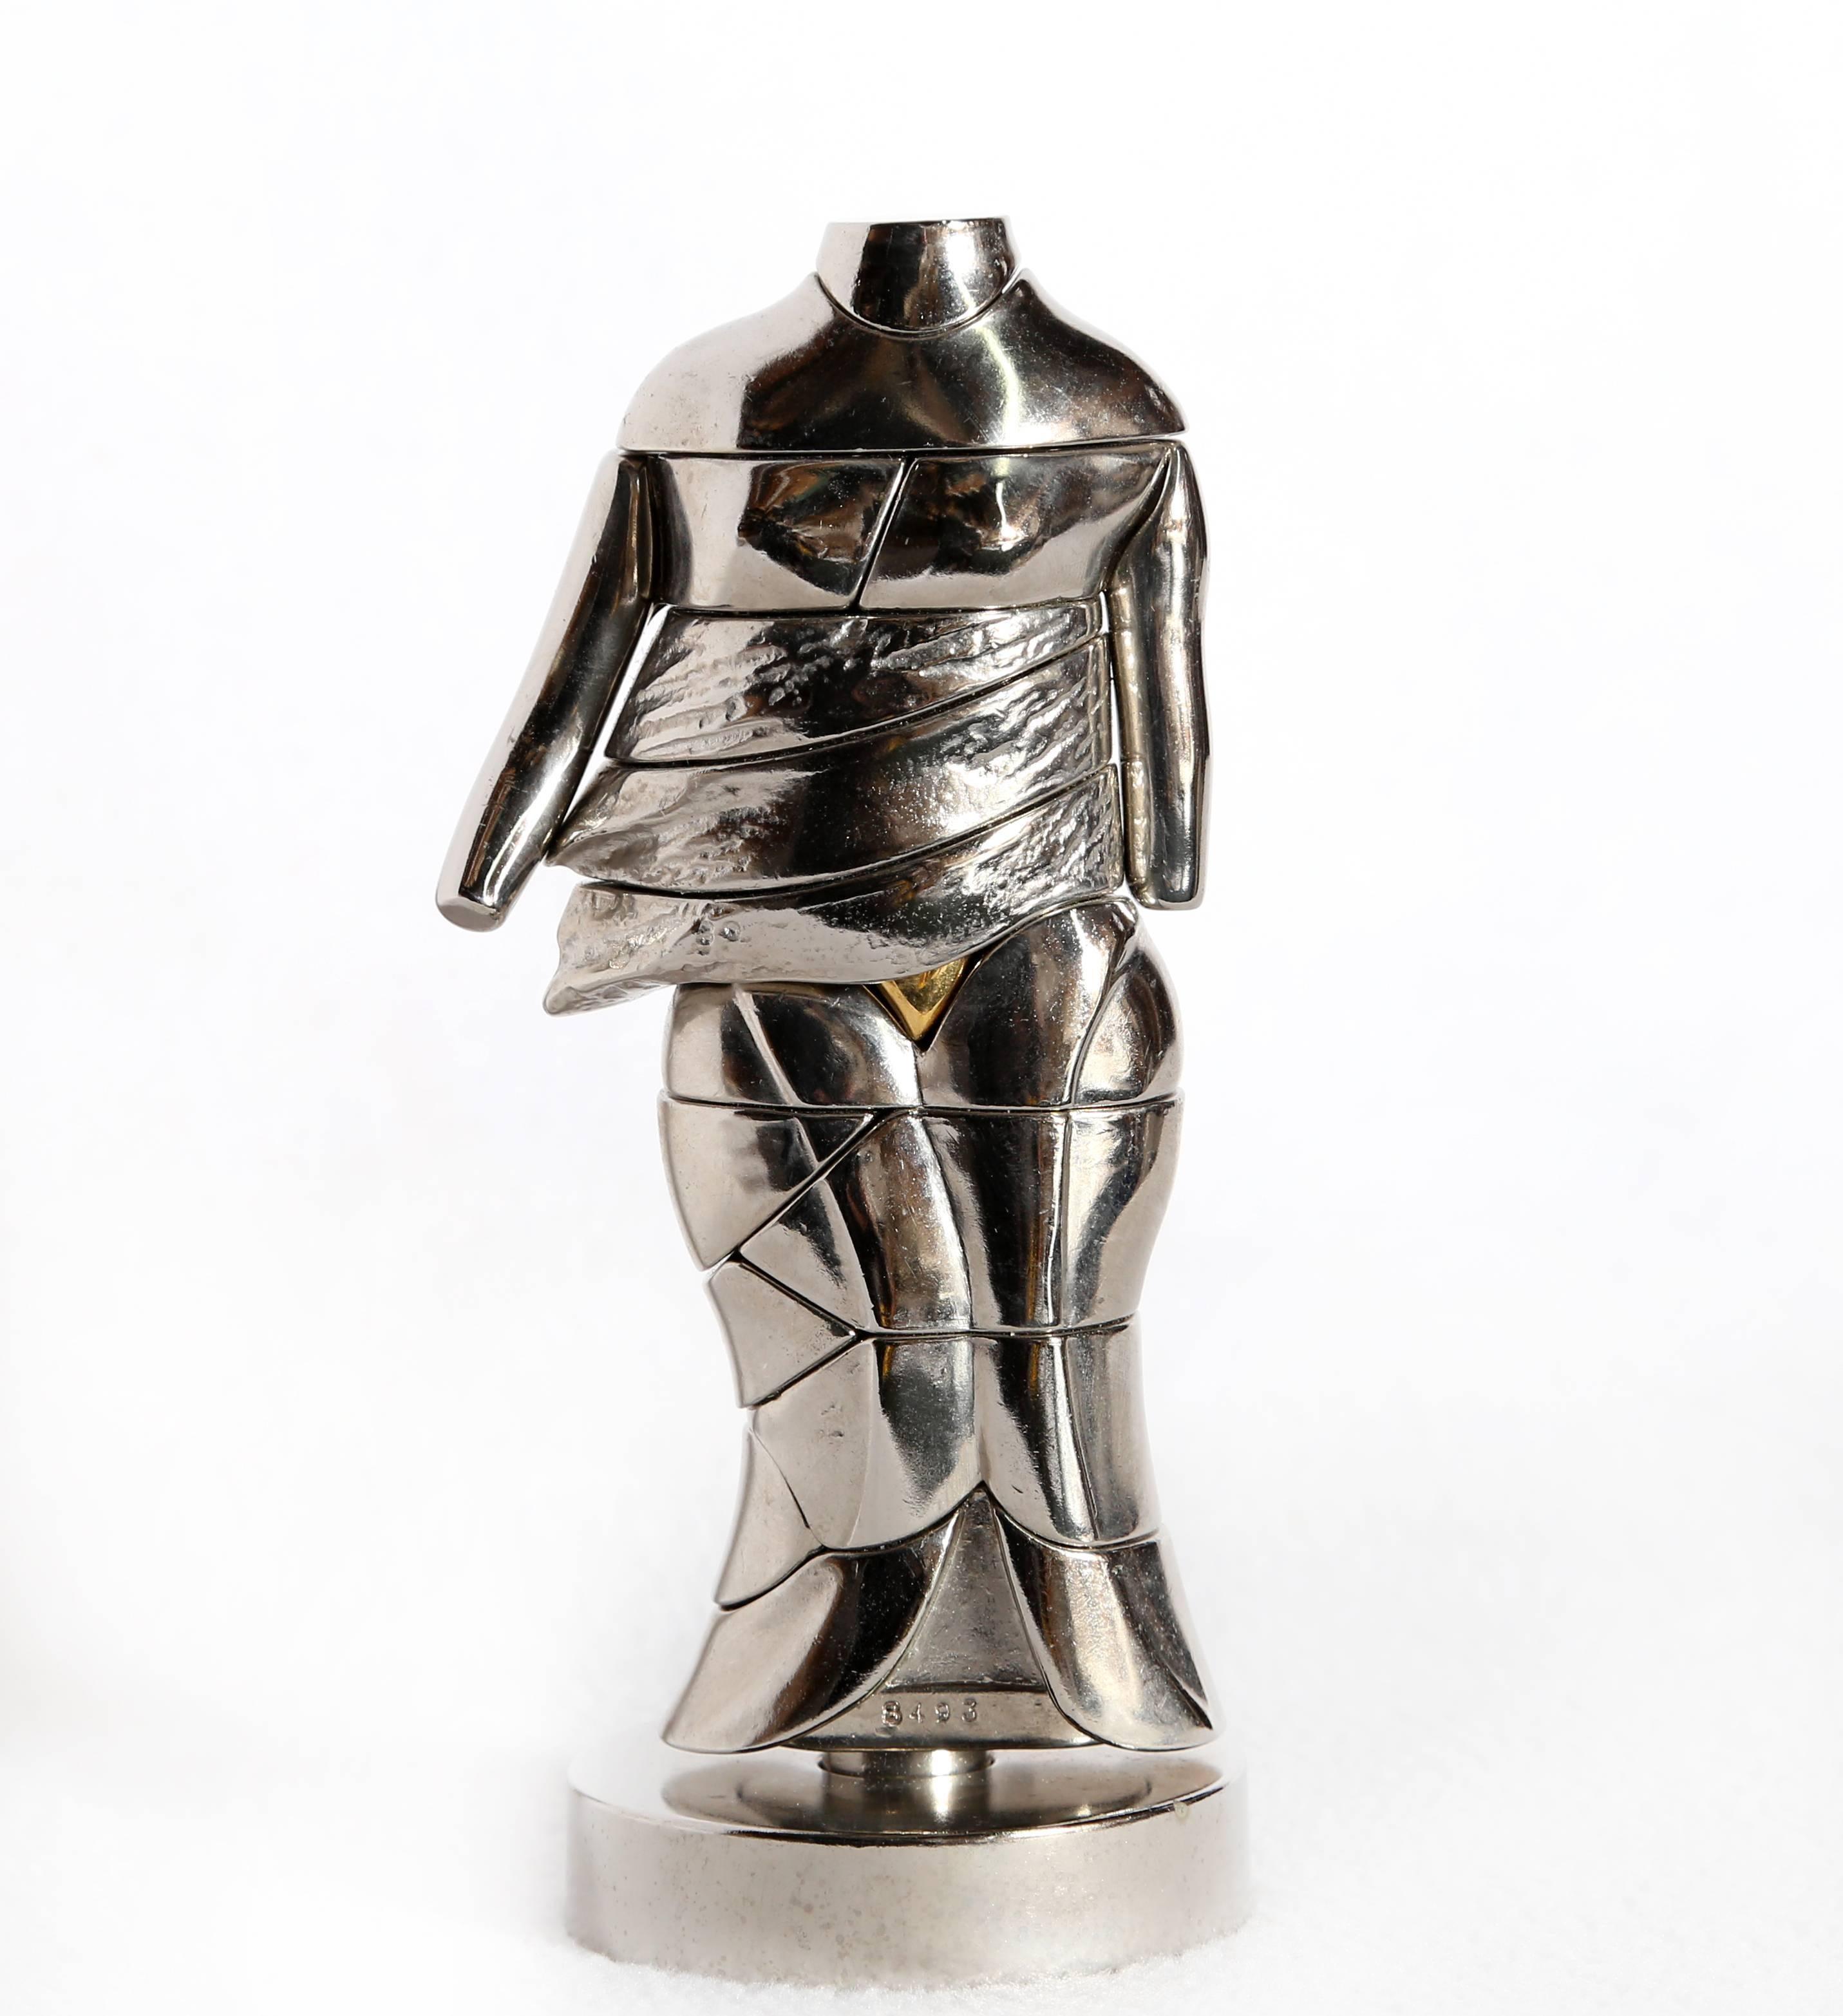 Mini-Cariatide, Nickel Puzzle Sculpture by Berrocal 1968